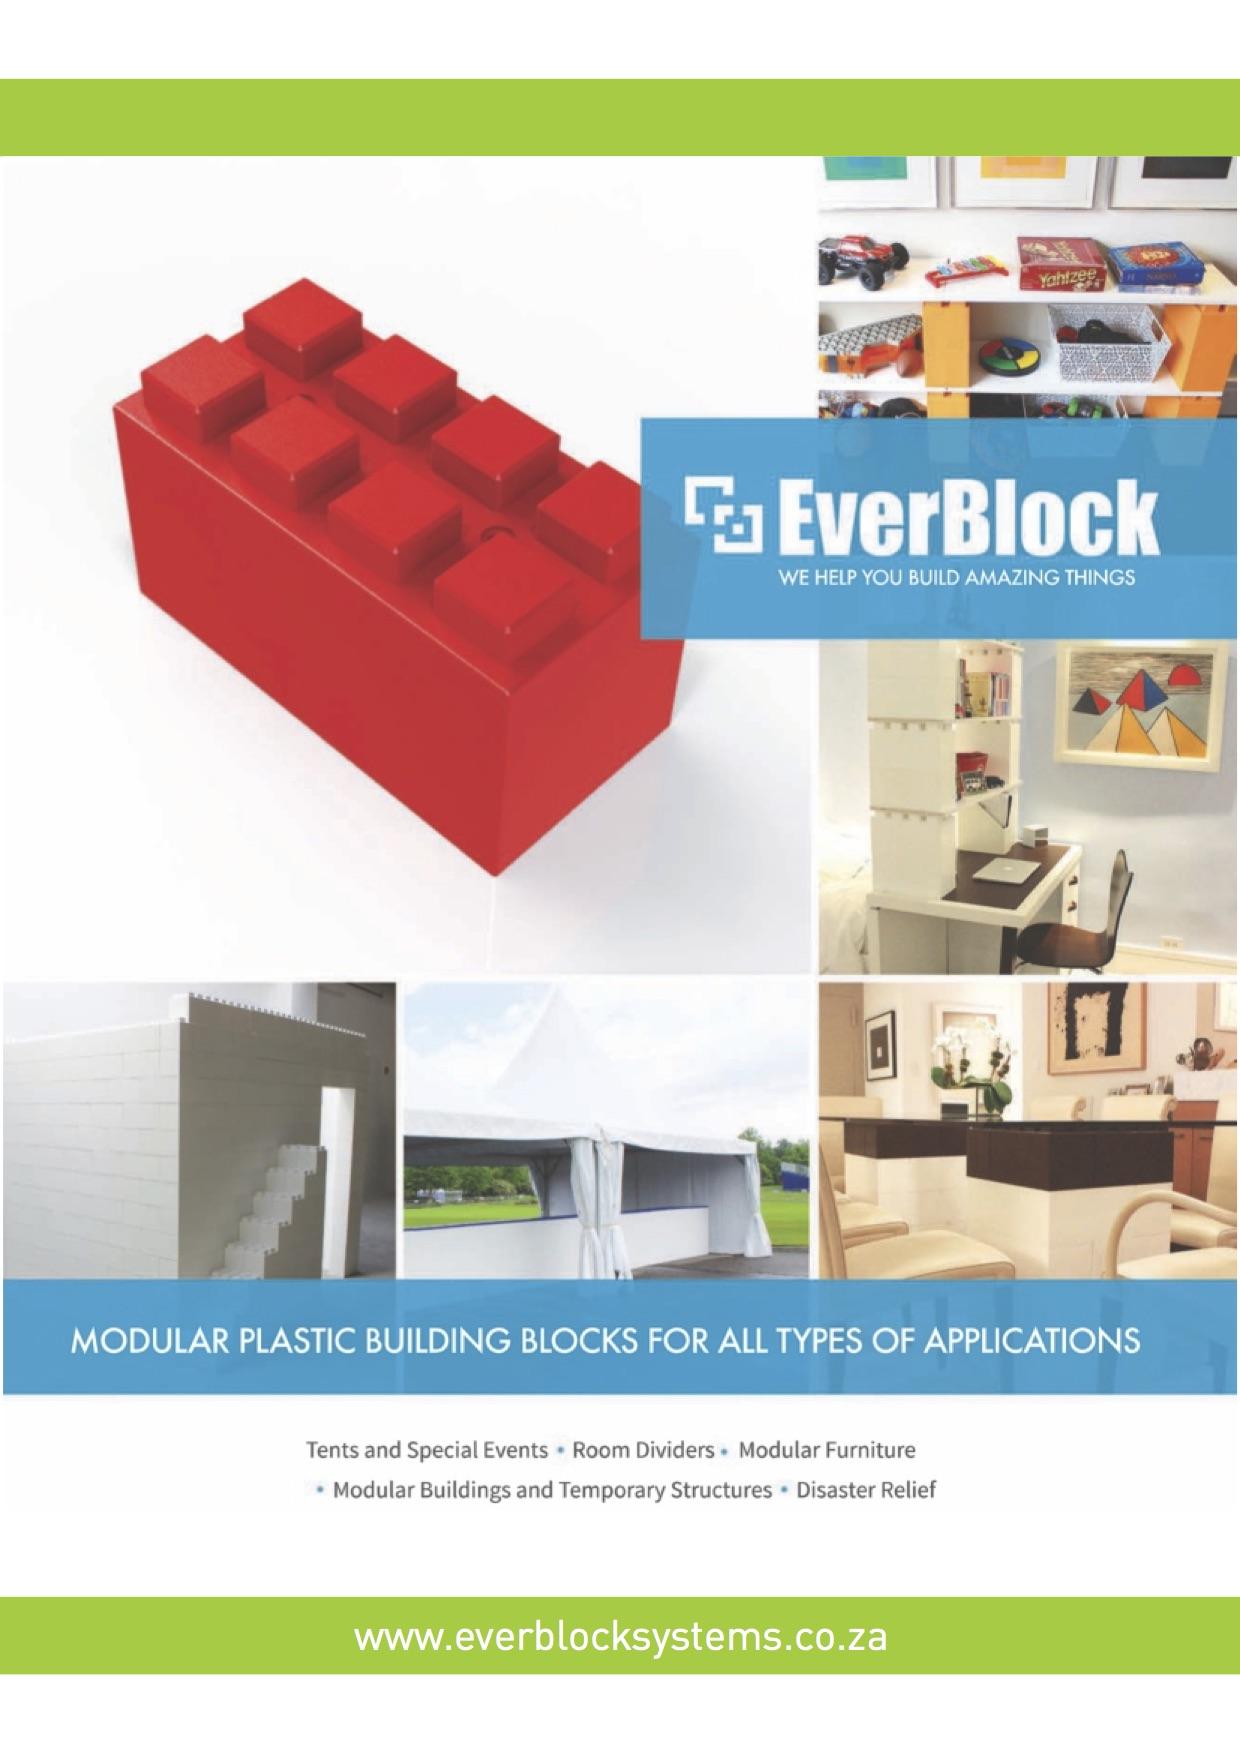 EverBlock BrochureSA.jpg